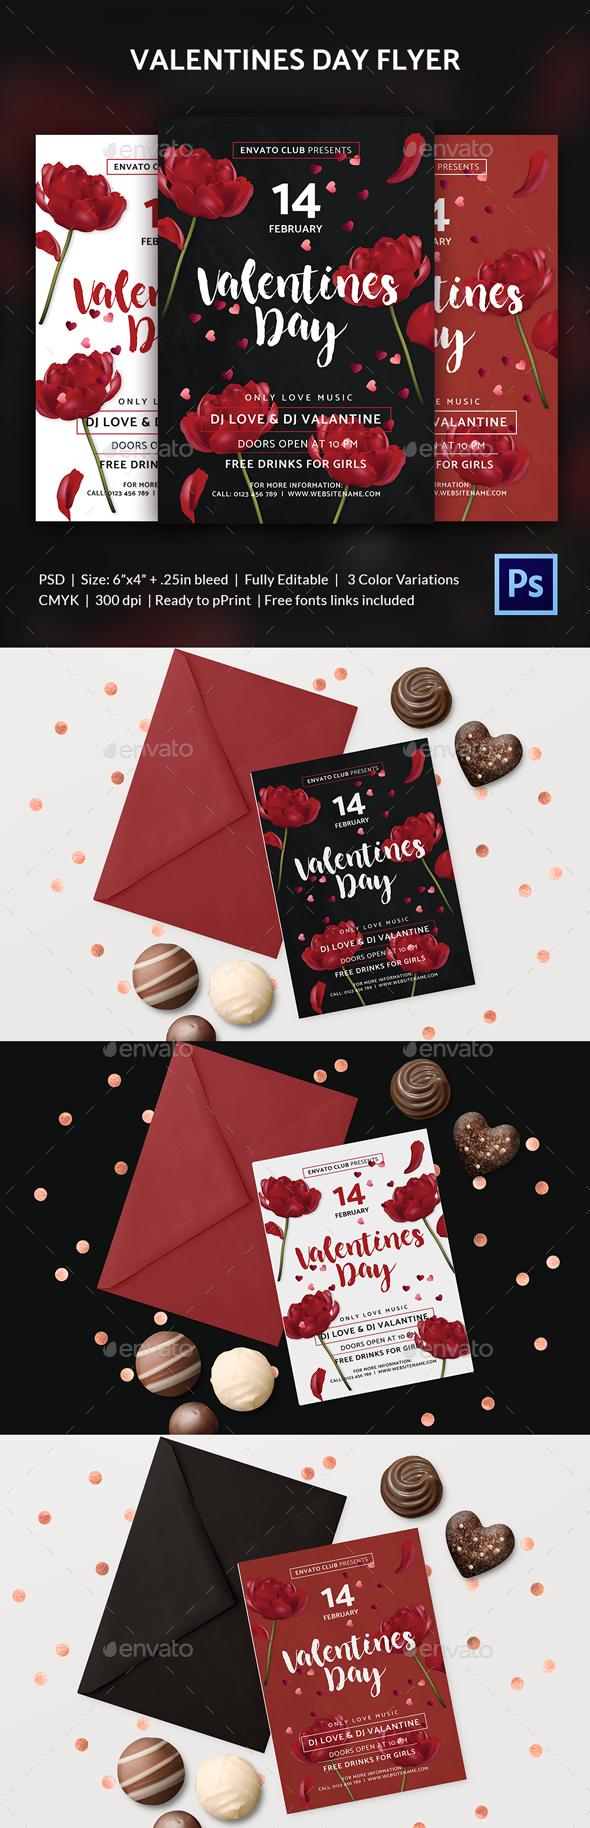 Valentines Day Flyer - Print Templates